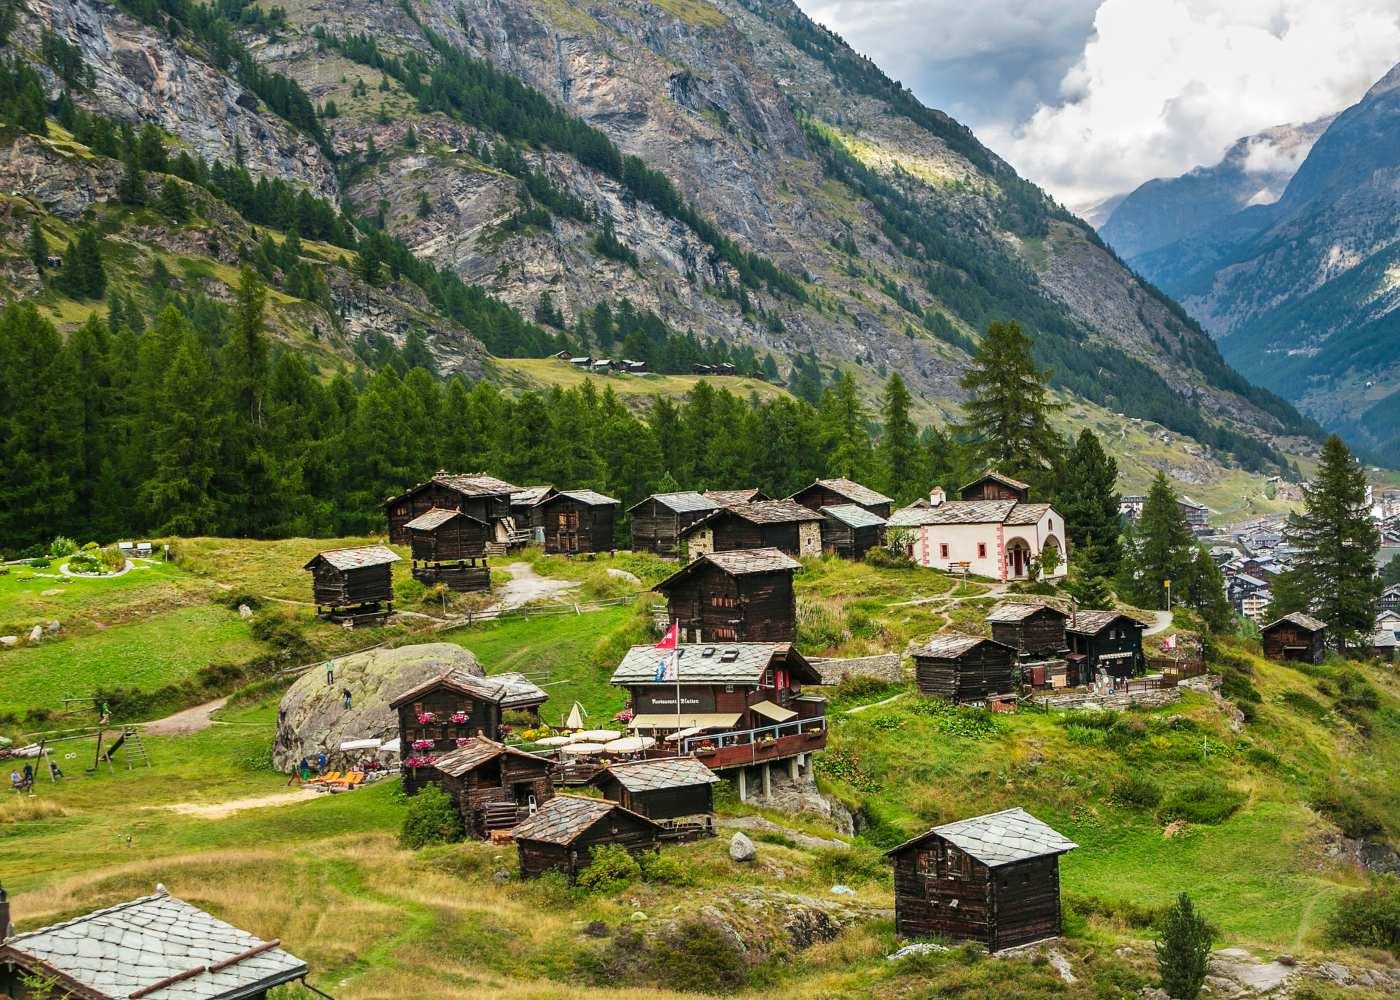 Vila de Zermatt na Suíça